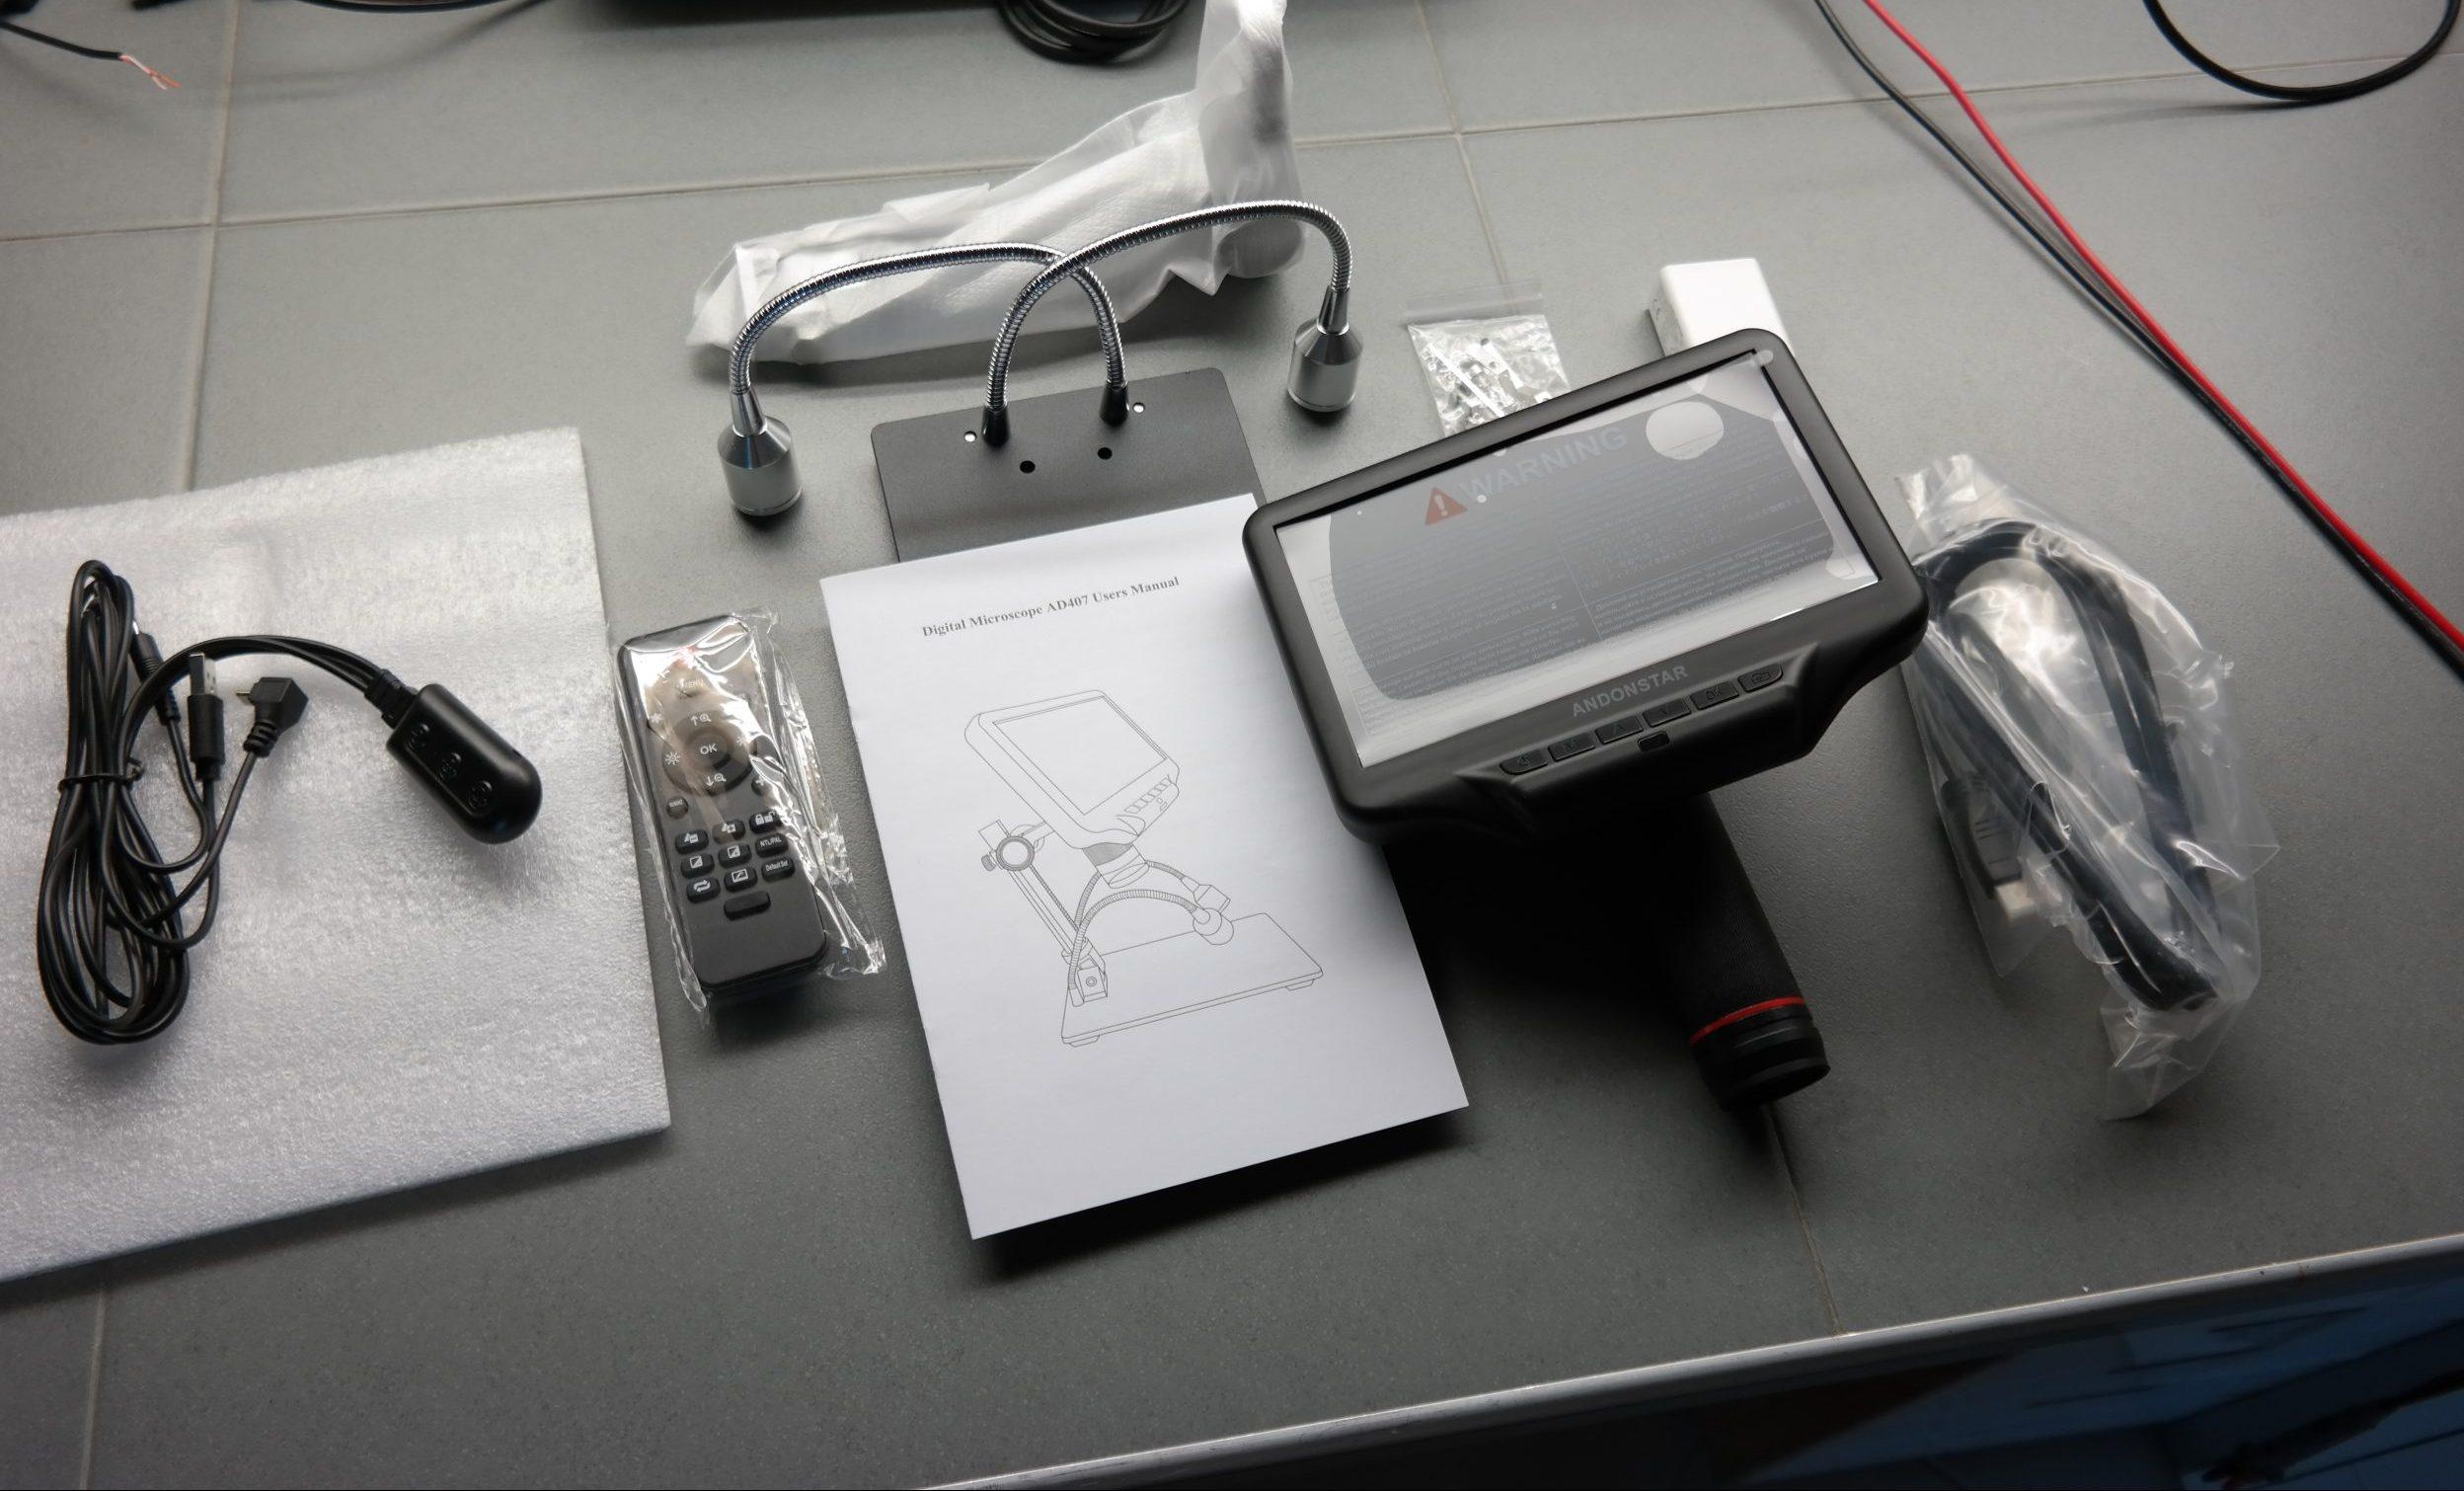 Andonstar AD407 HDMI Digital USB Microscope Review